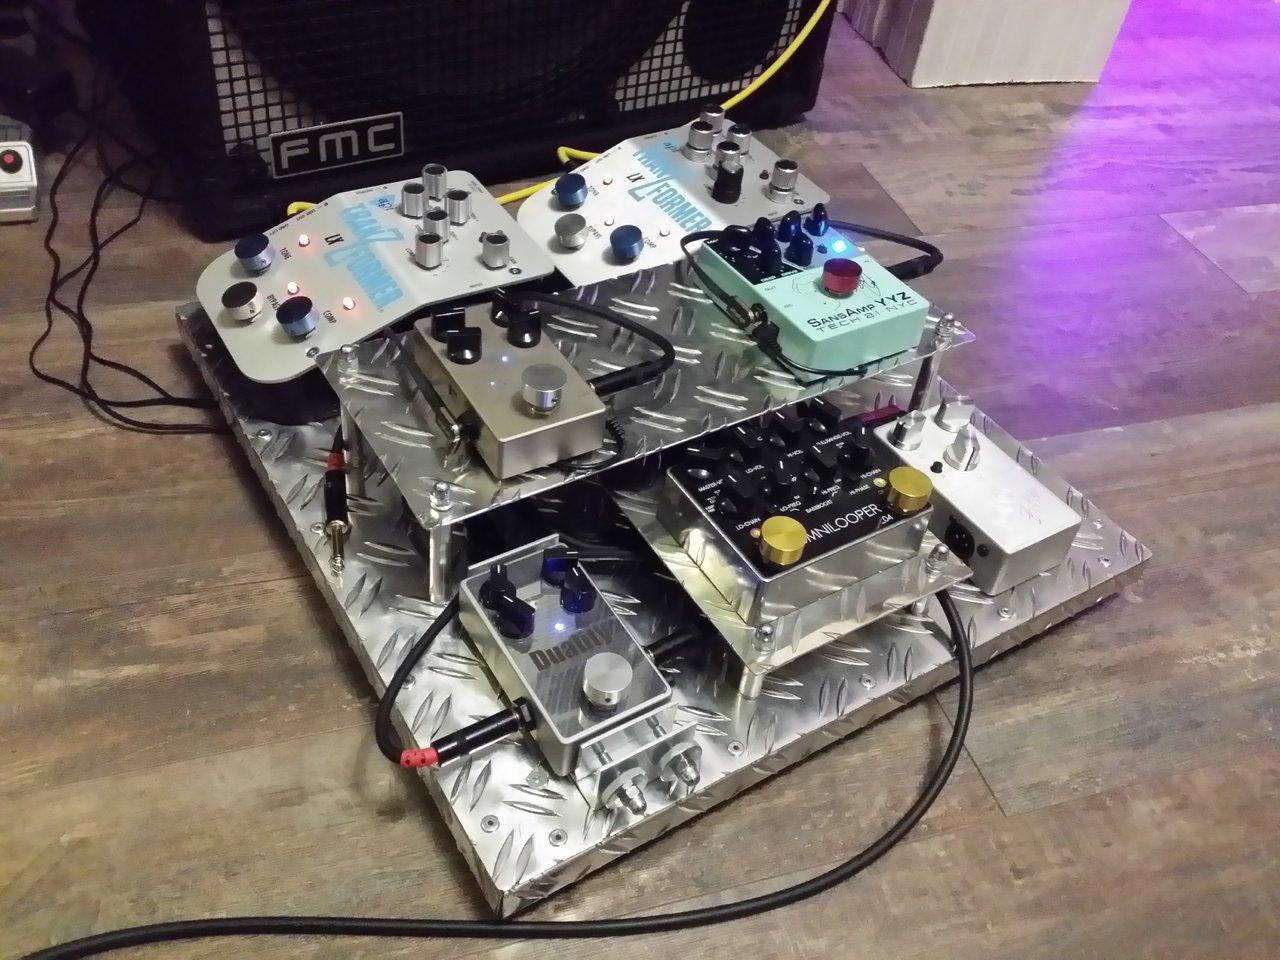 pedalboard-jpg.372571